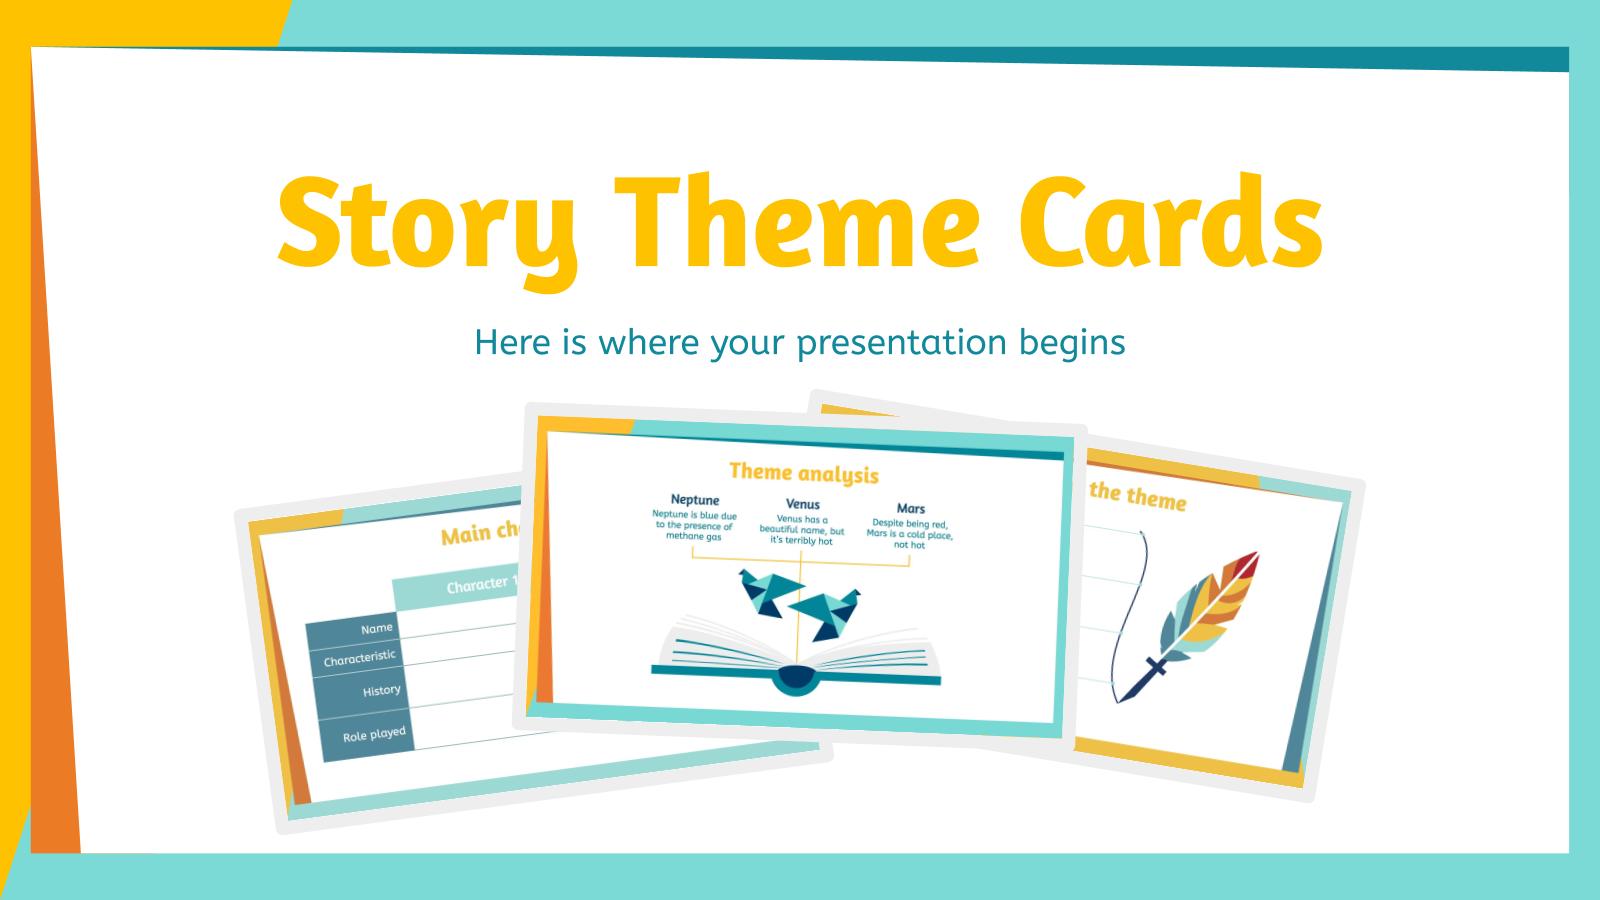 Story Theme Cards presentation template